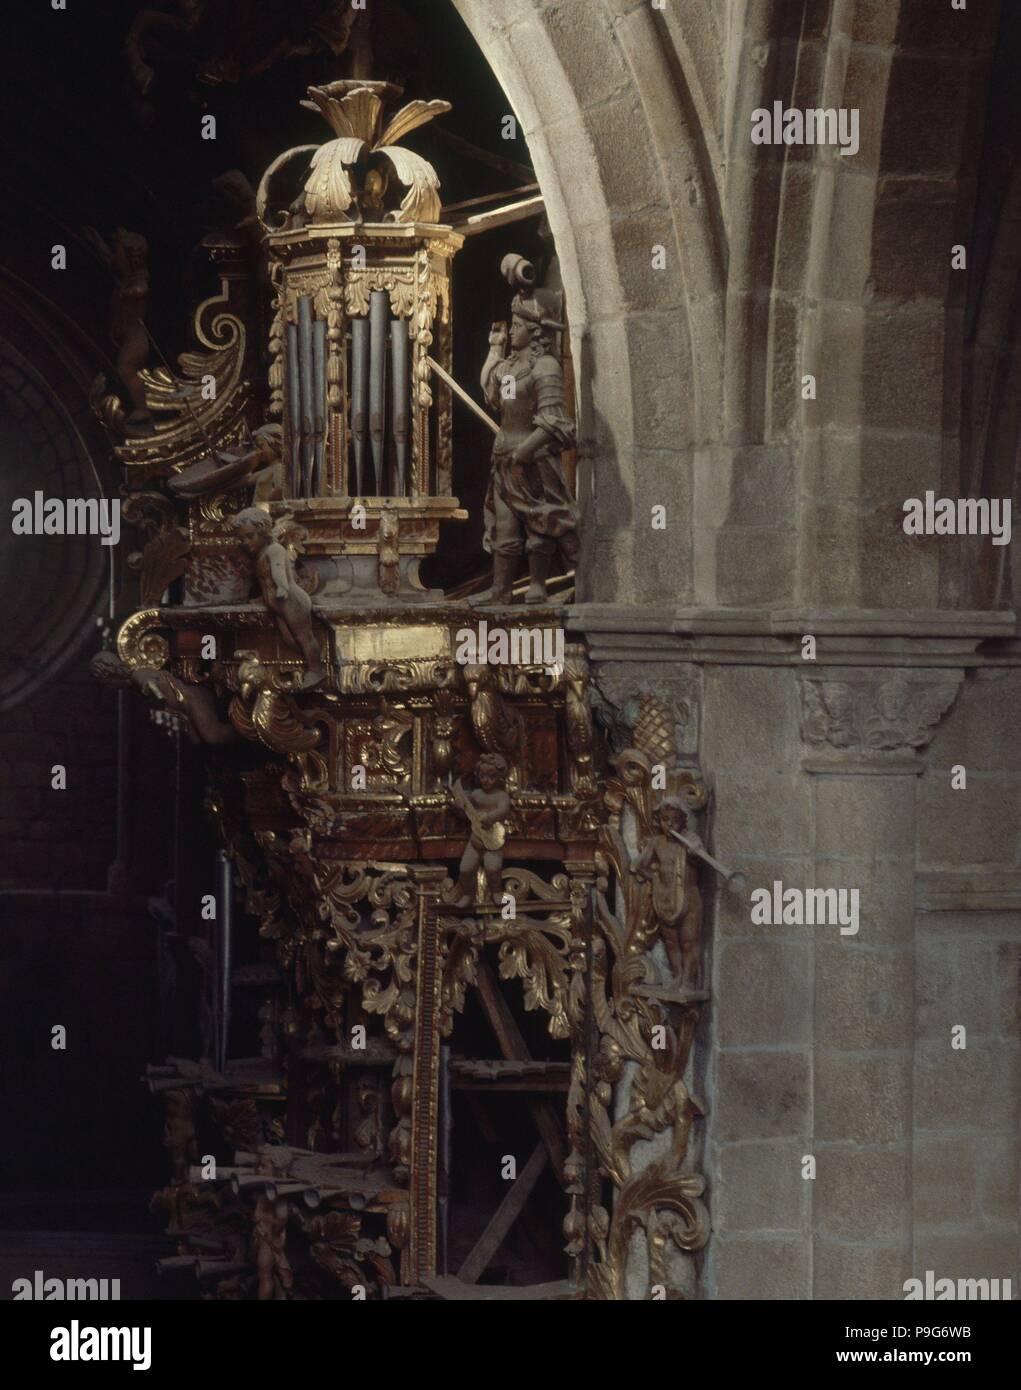 ORGANO. Ubicación: Catedral, Tuy, Pontevedra. Imagen De Stock